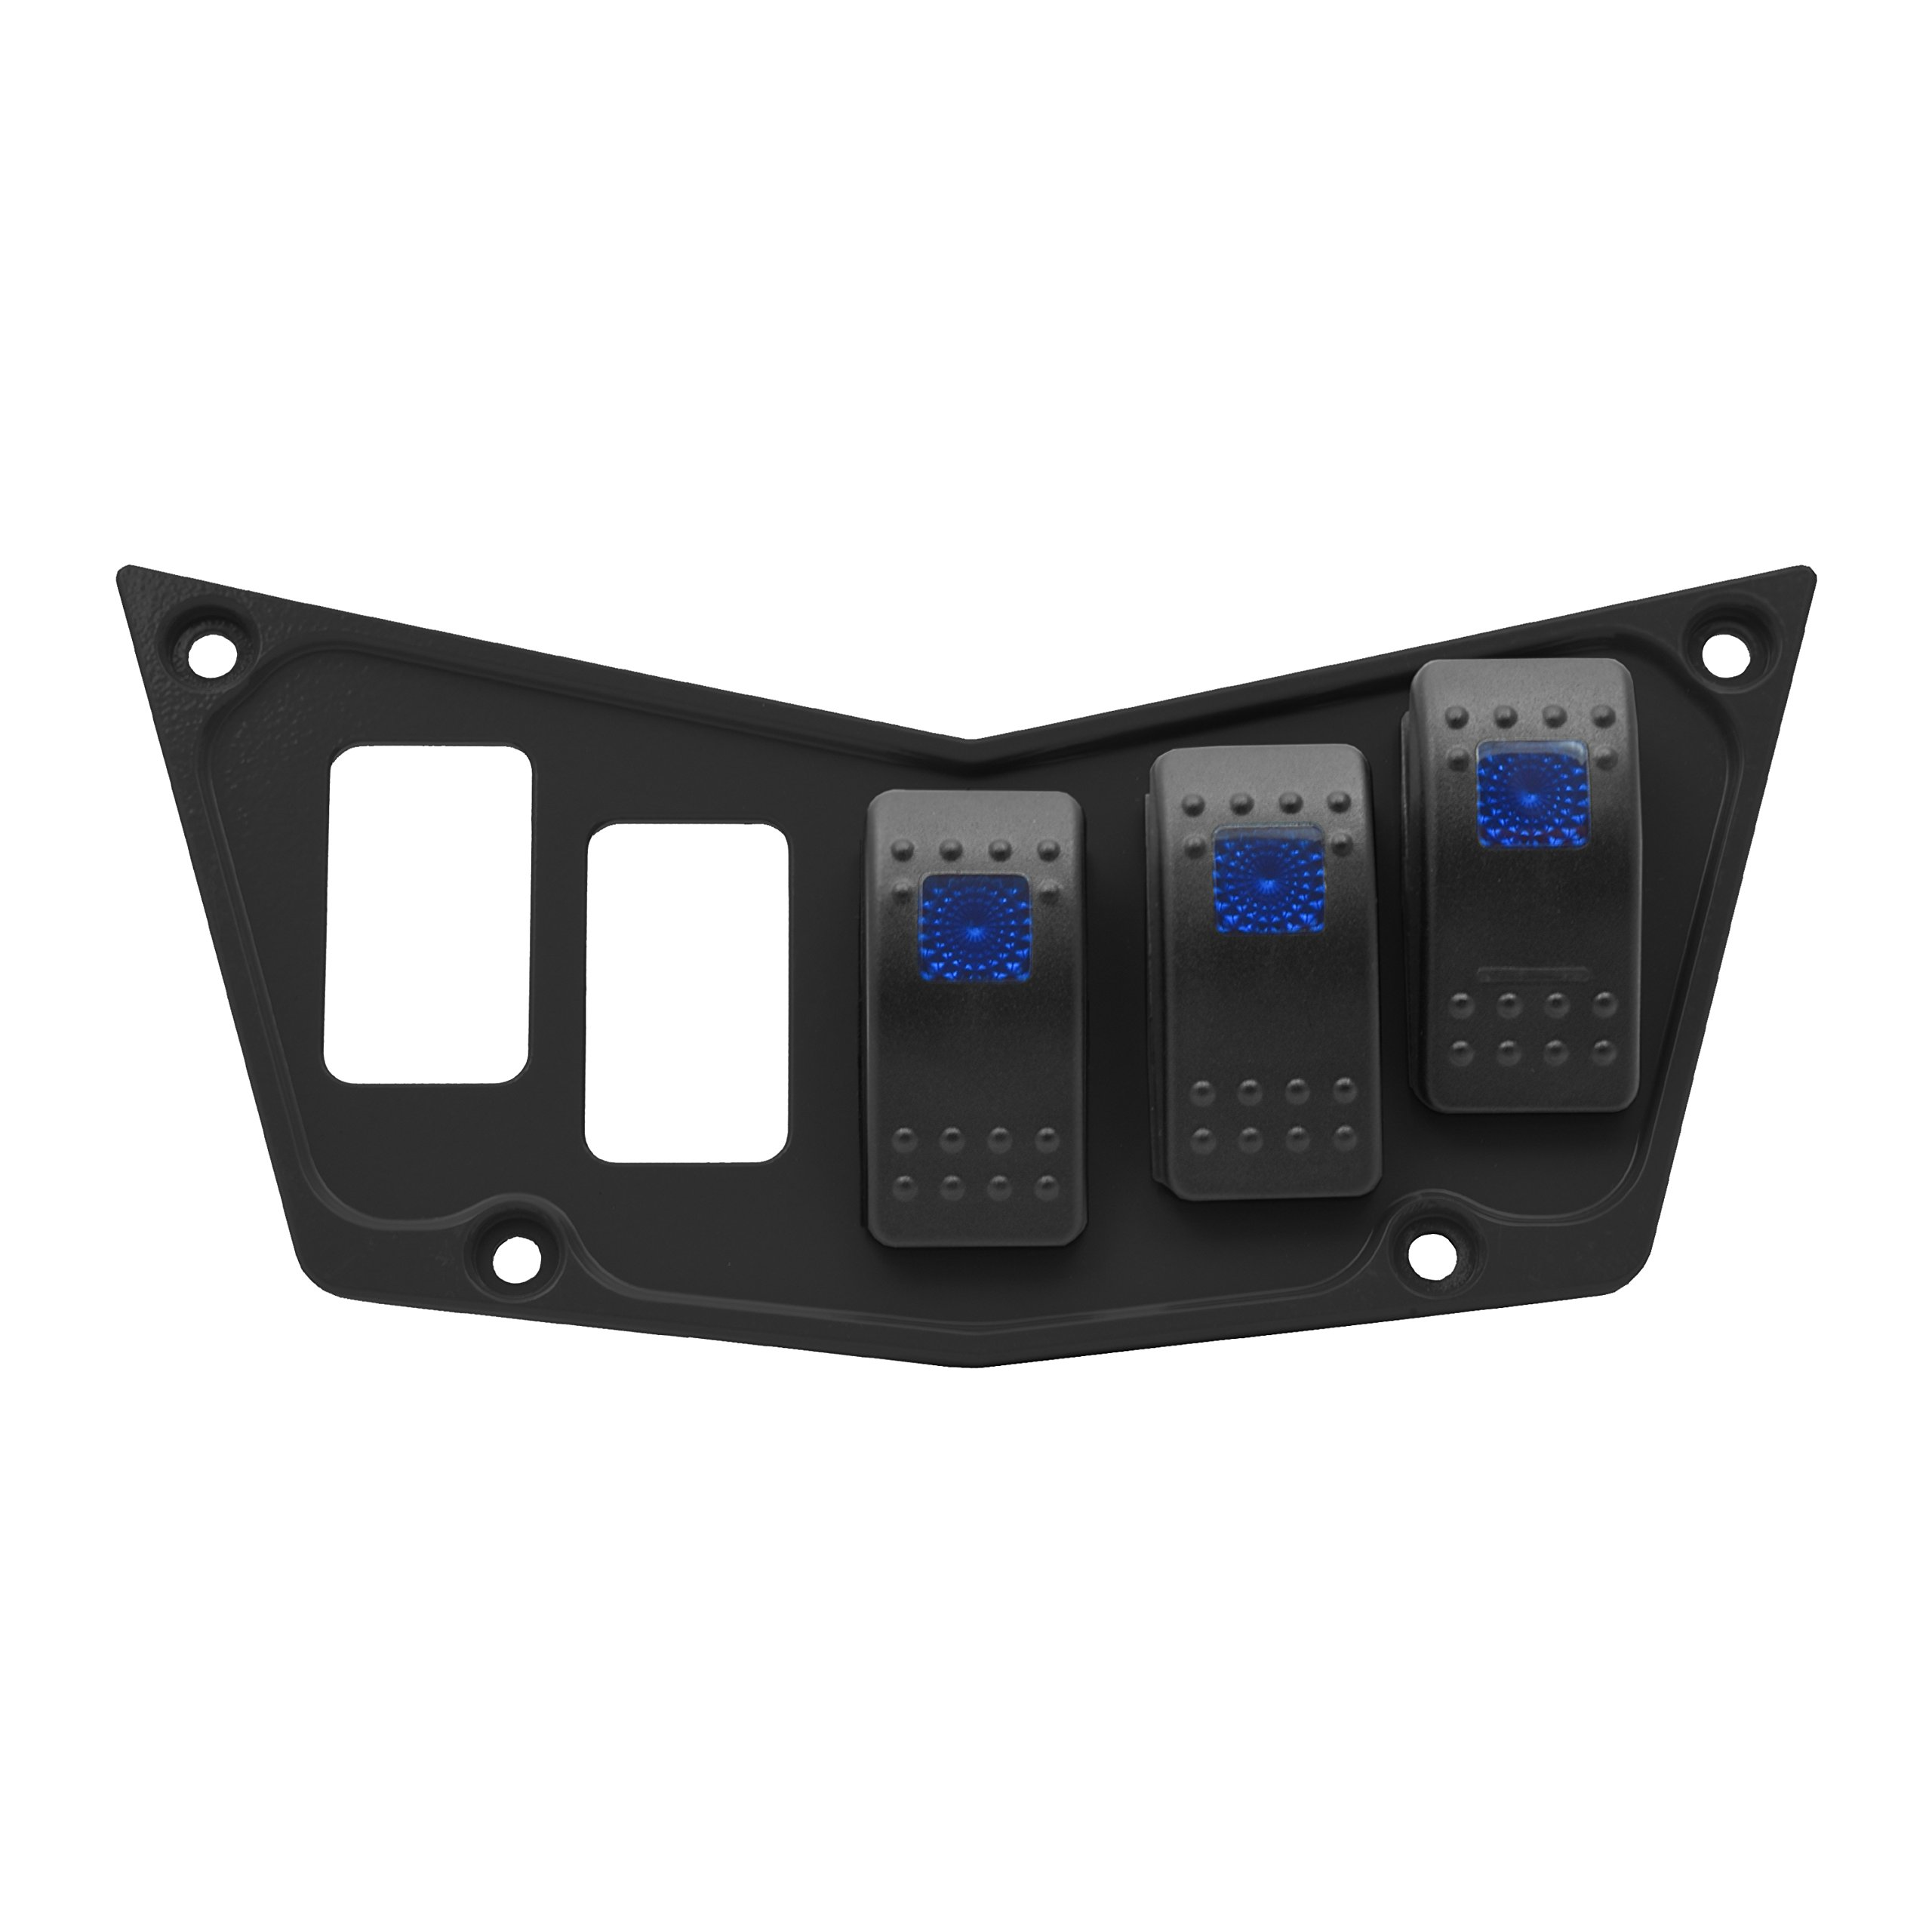 STV Motorsports Custom Aluminum Black Dash Panel for Polaris RZR XP 900, 800, S, 570, Jagged X with 3 Free Rocker Switches